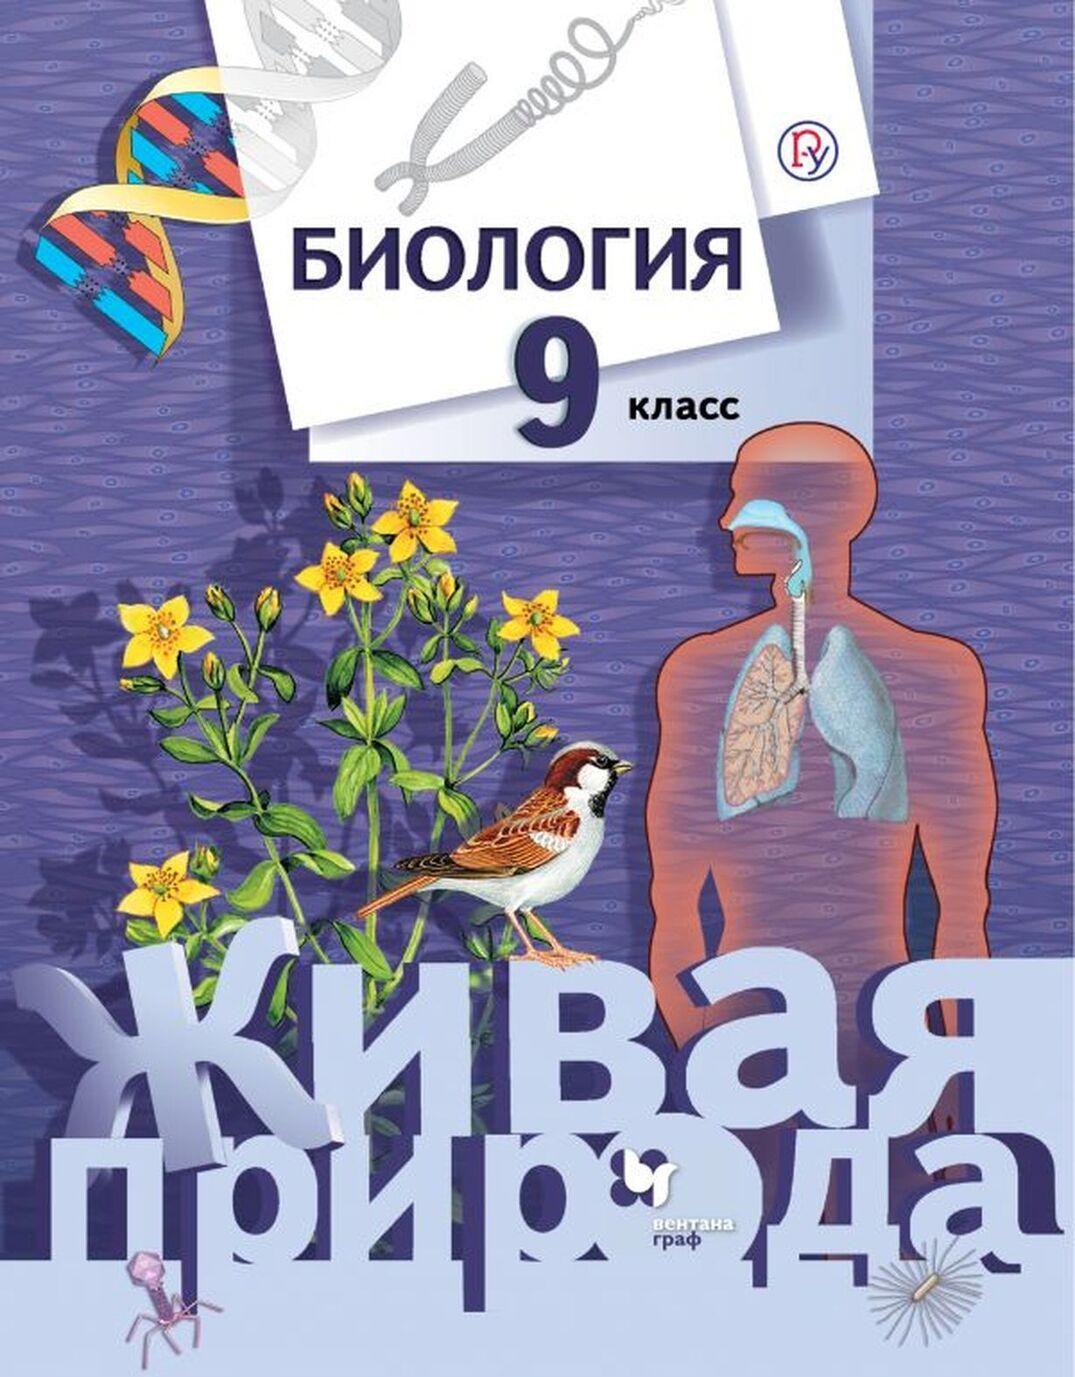 Biologija. 9 klass. Uchebnik | Sukhova Tamara Sergeevna, Sarycheva Natalija Jurevna